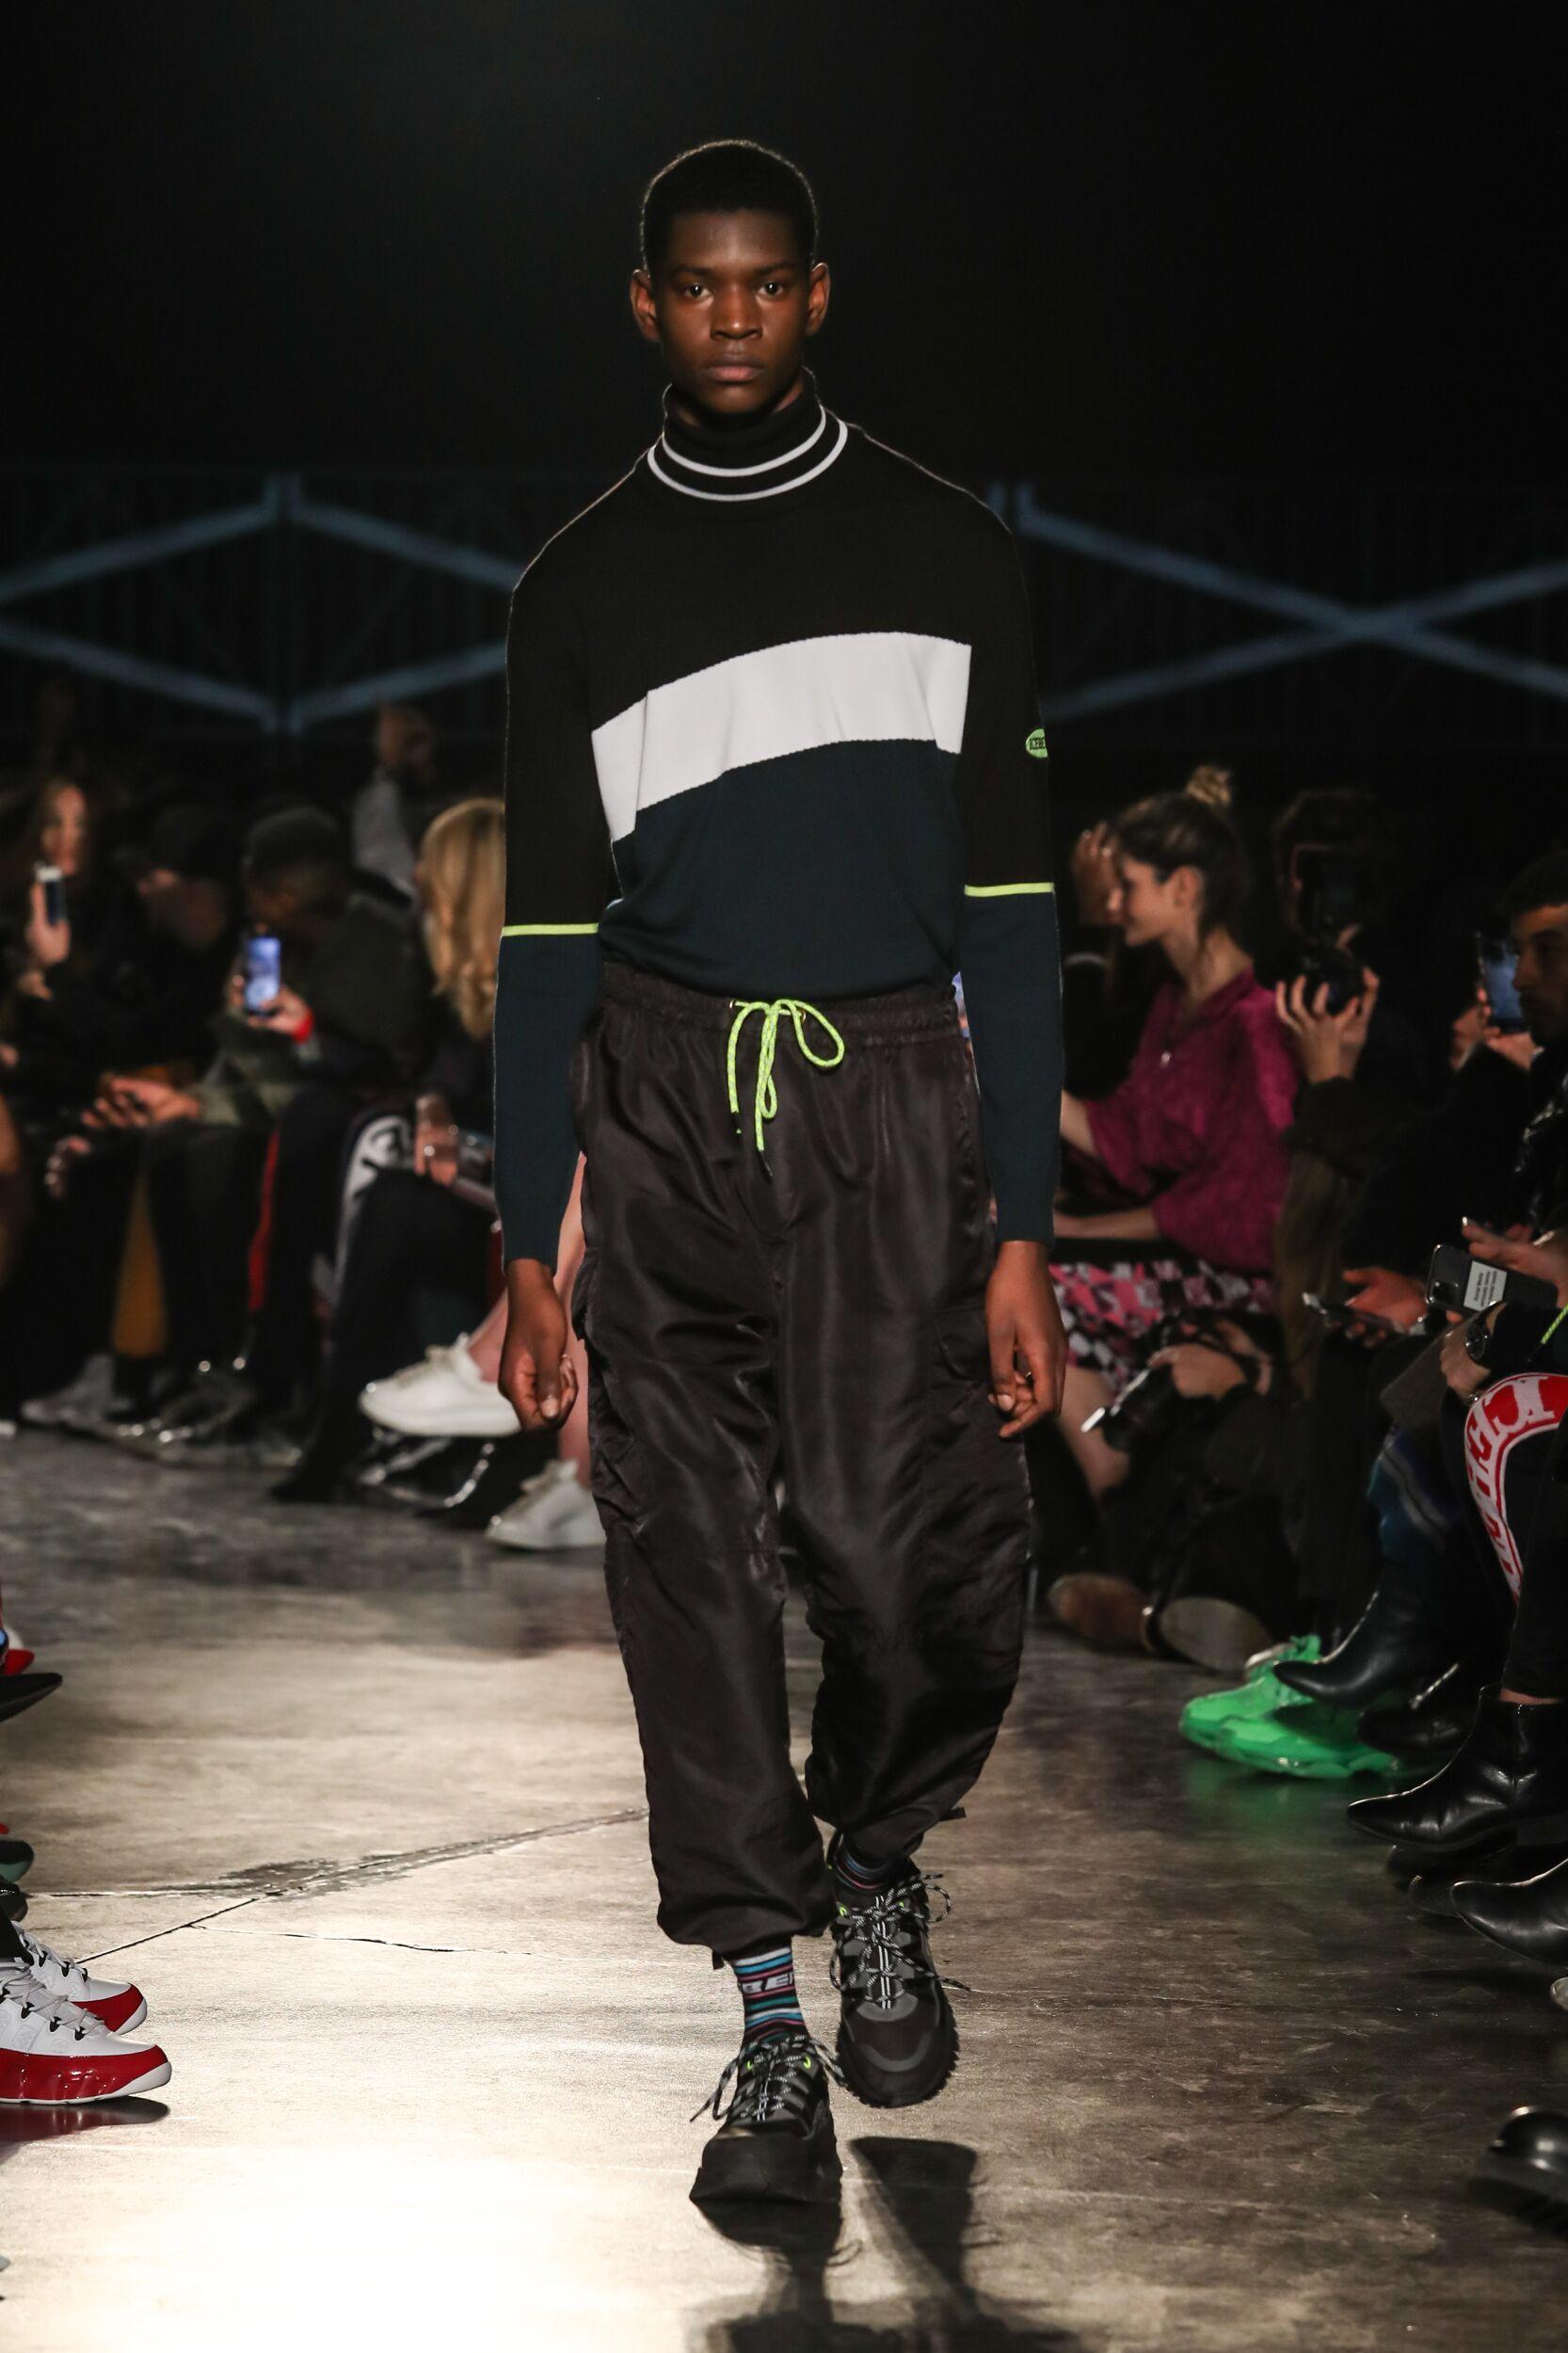 Iceberg FW 2020 Menswear